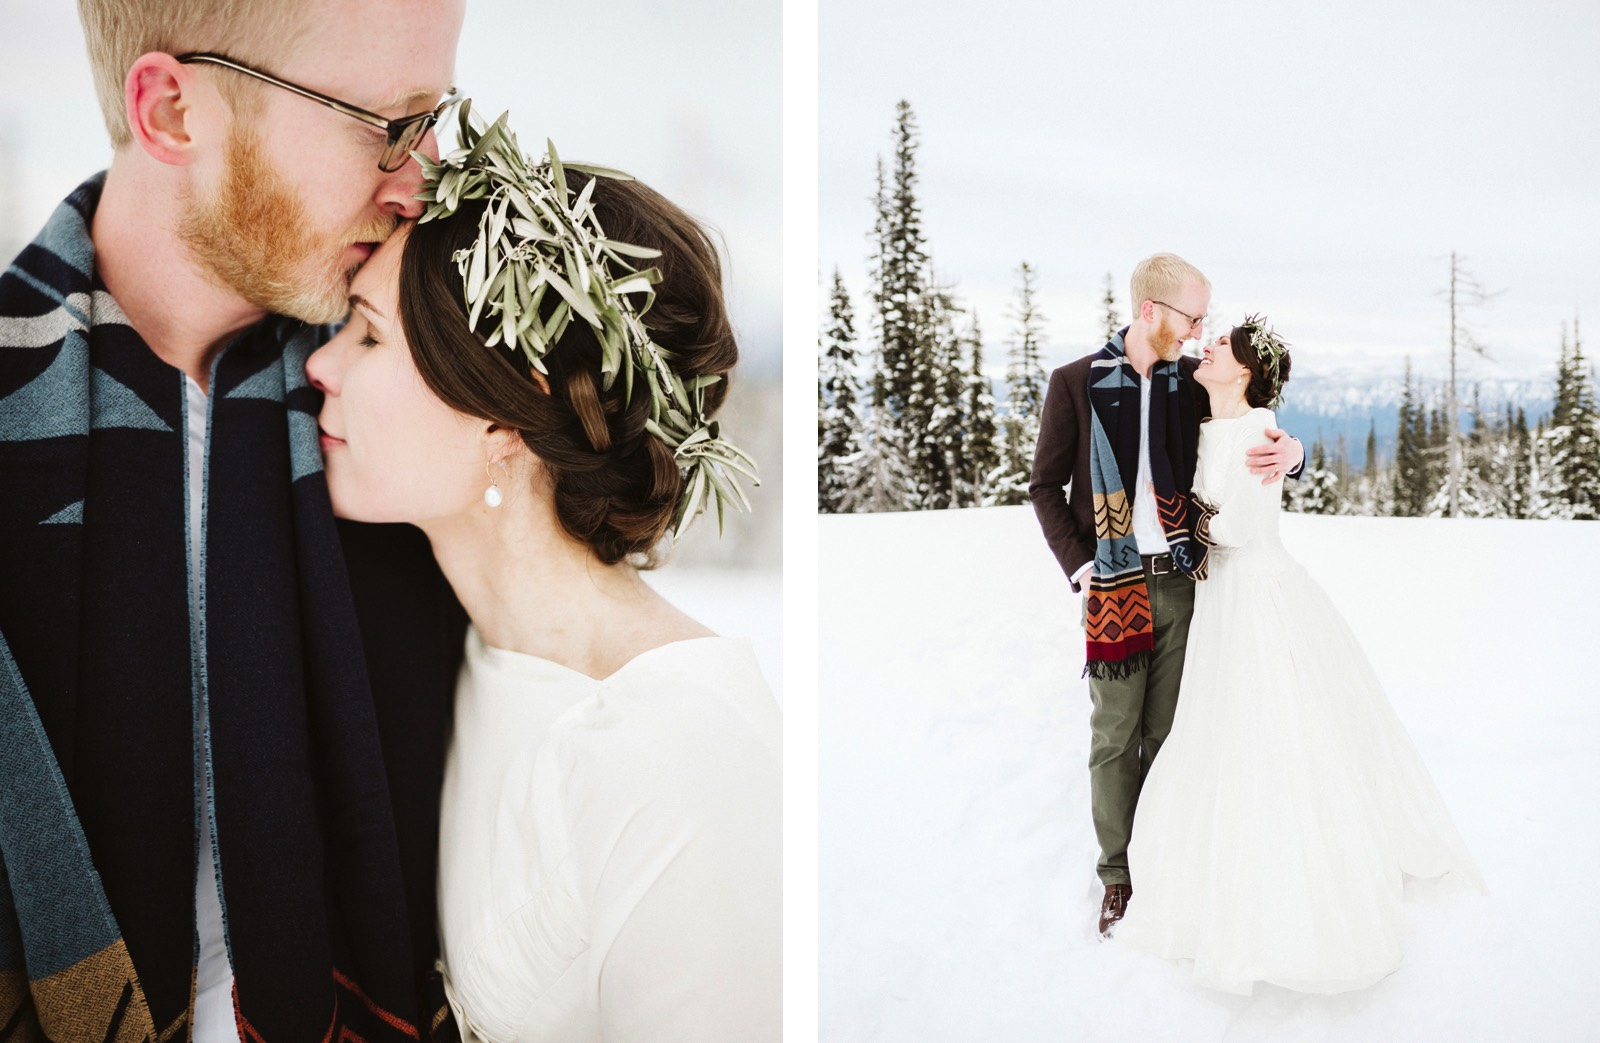 alpine-lakes-high-camp-winter-wedding-72 ALPINE LAKES HIGH CAMP WEDDING